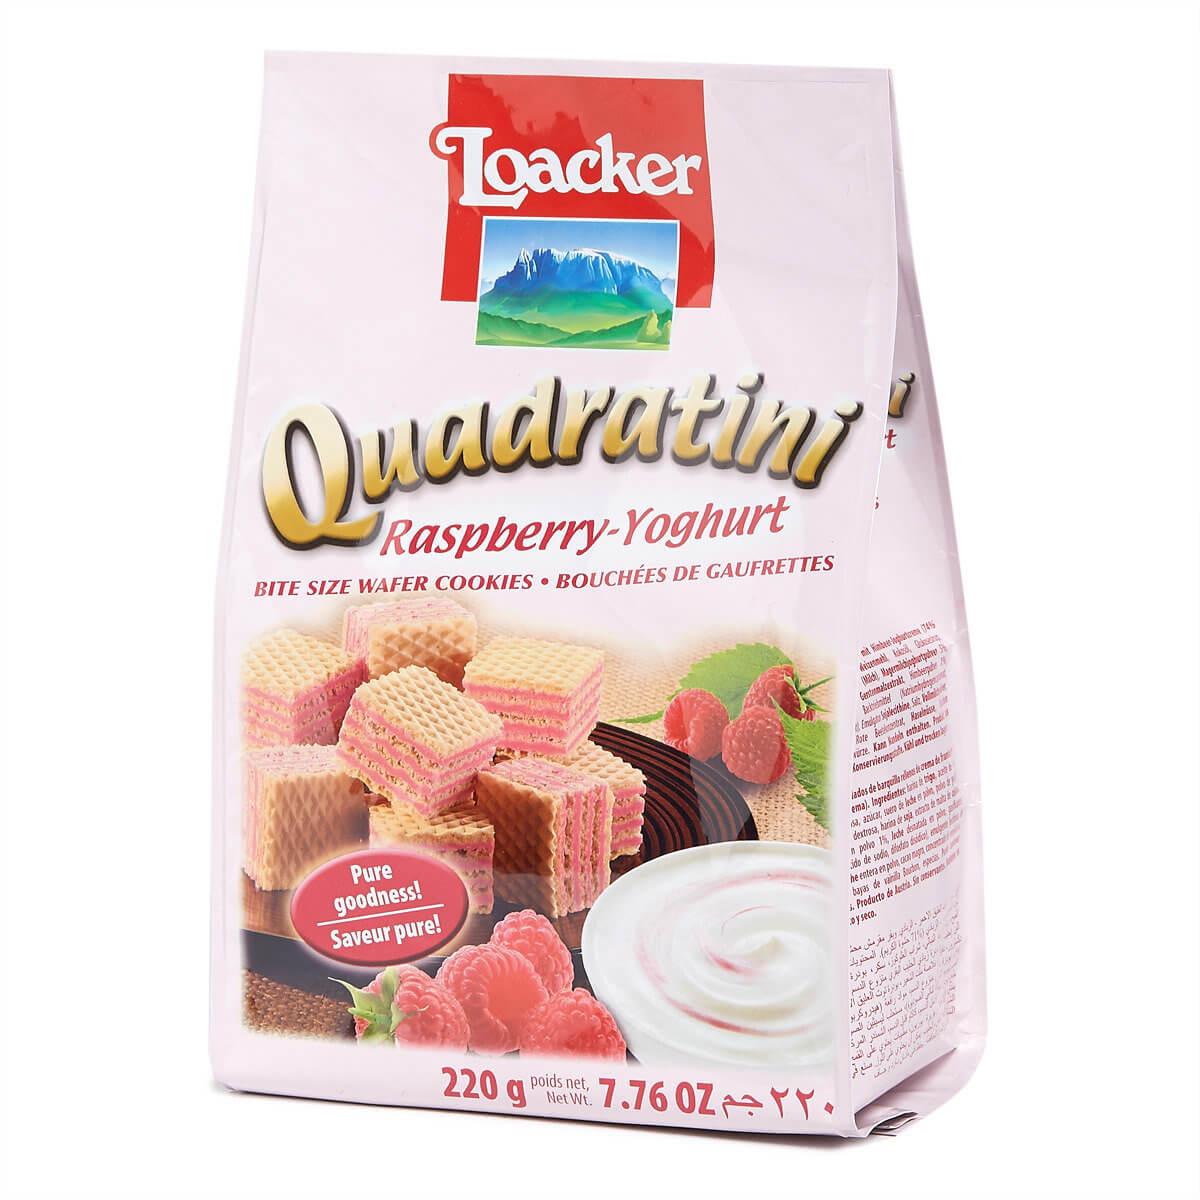 Loacker - Quadratini Raspberry-Yoghurt 220 g